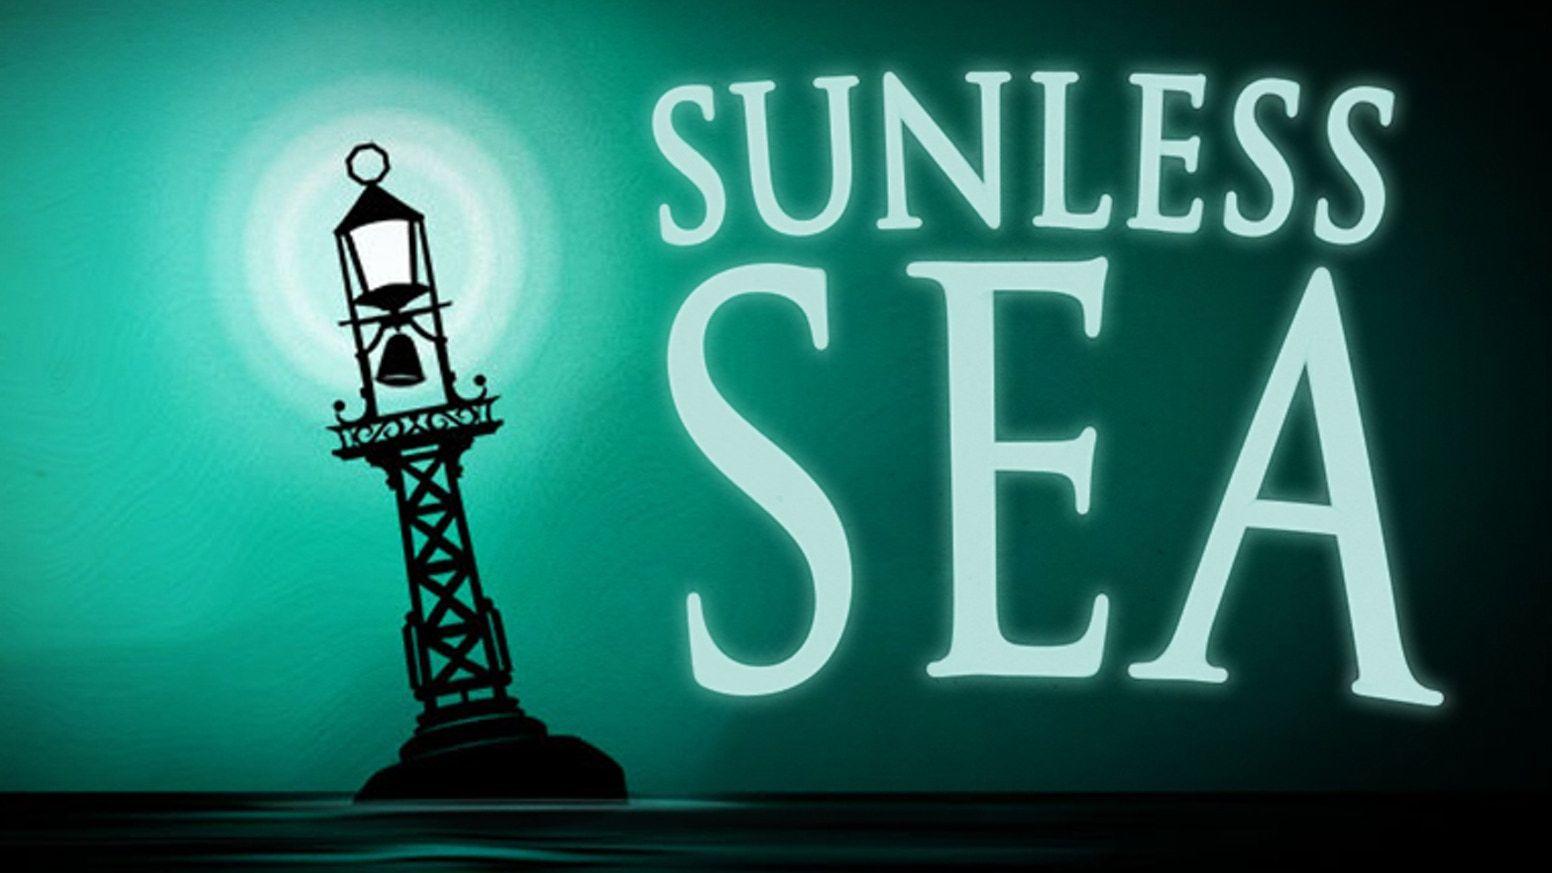 Sunless Sea za darmo w Epic Game Store do 4 marca